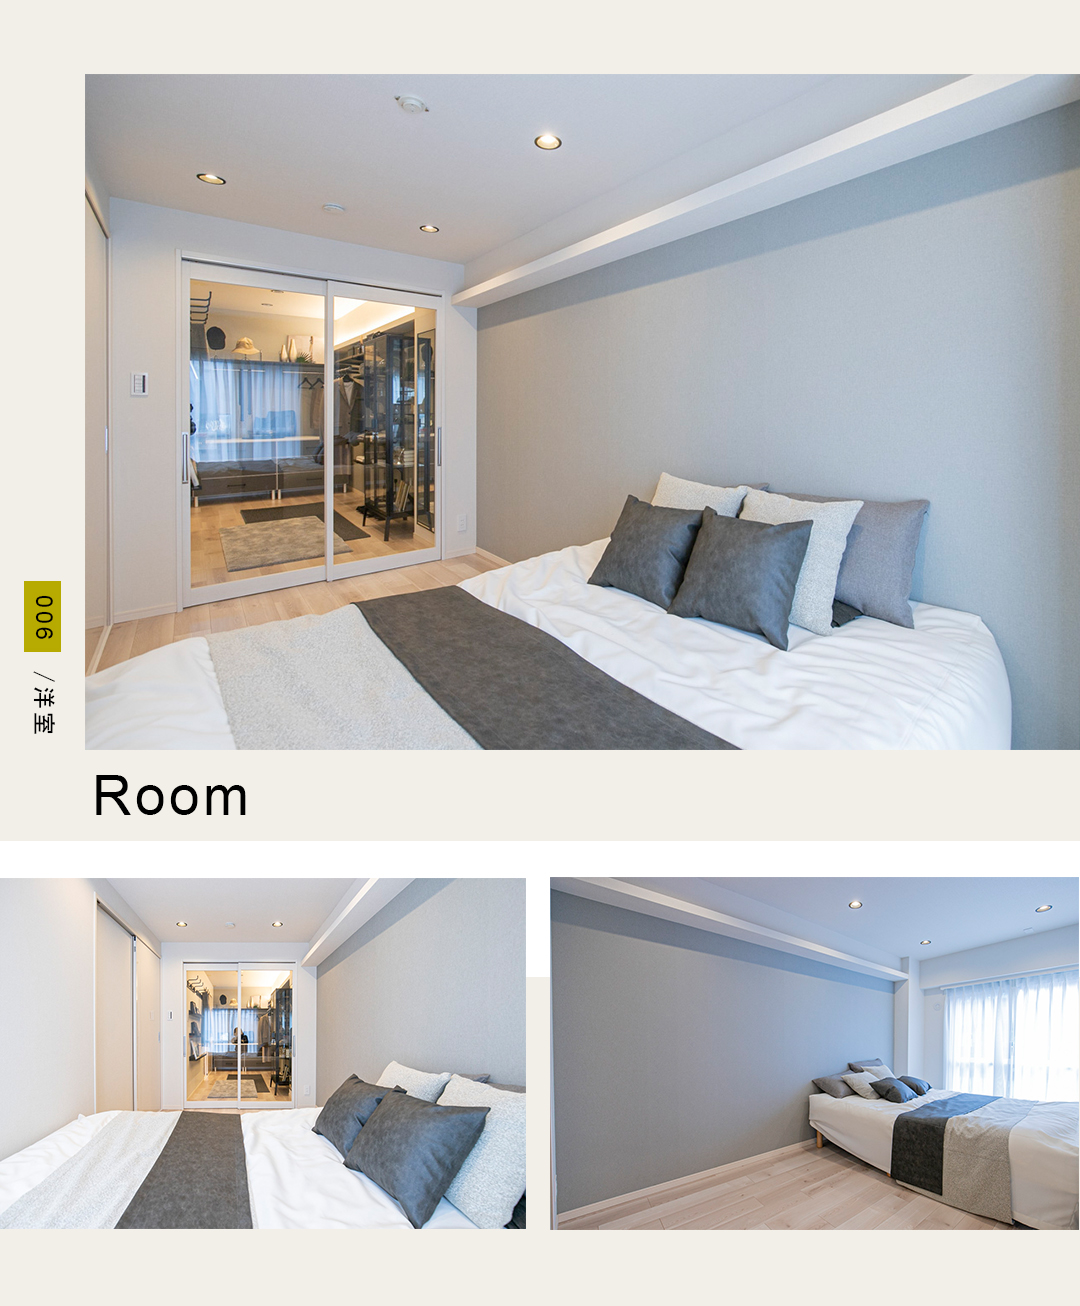 006,room,洋室